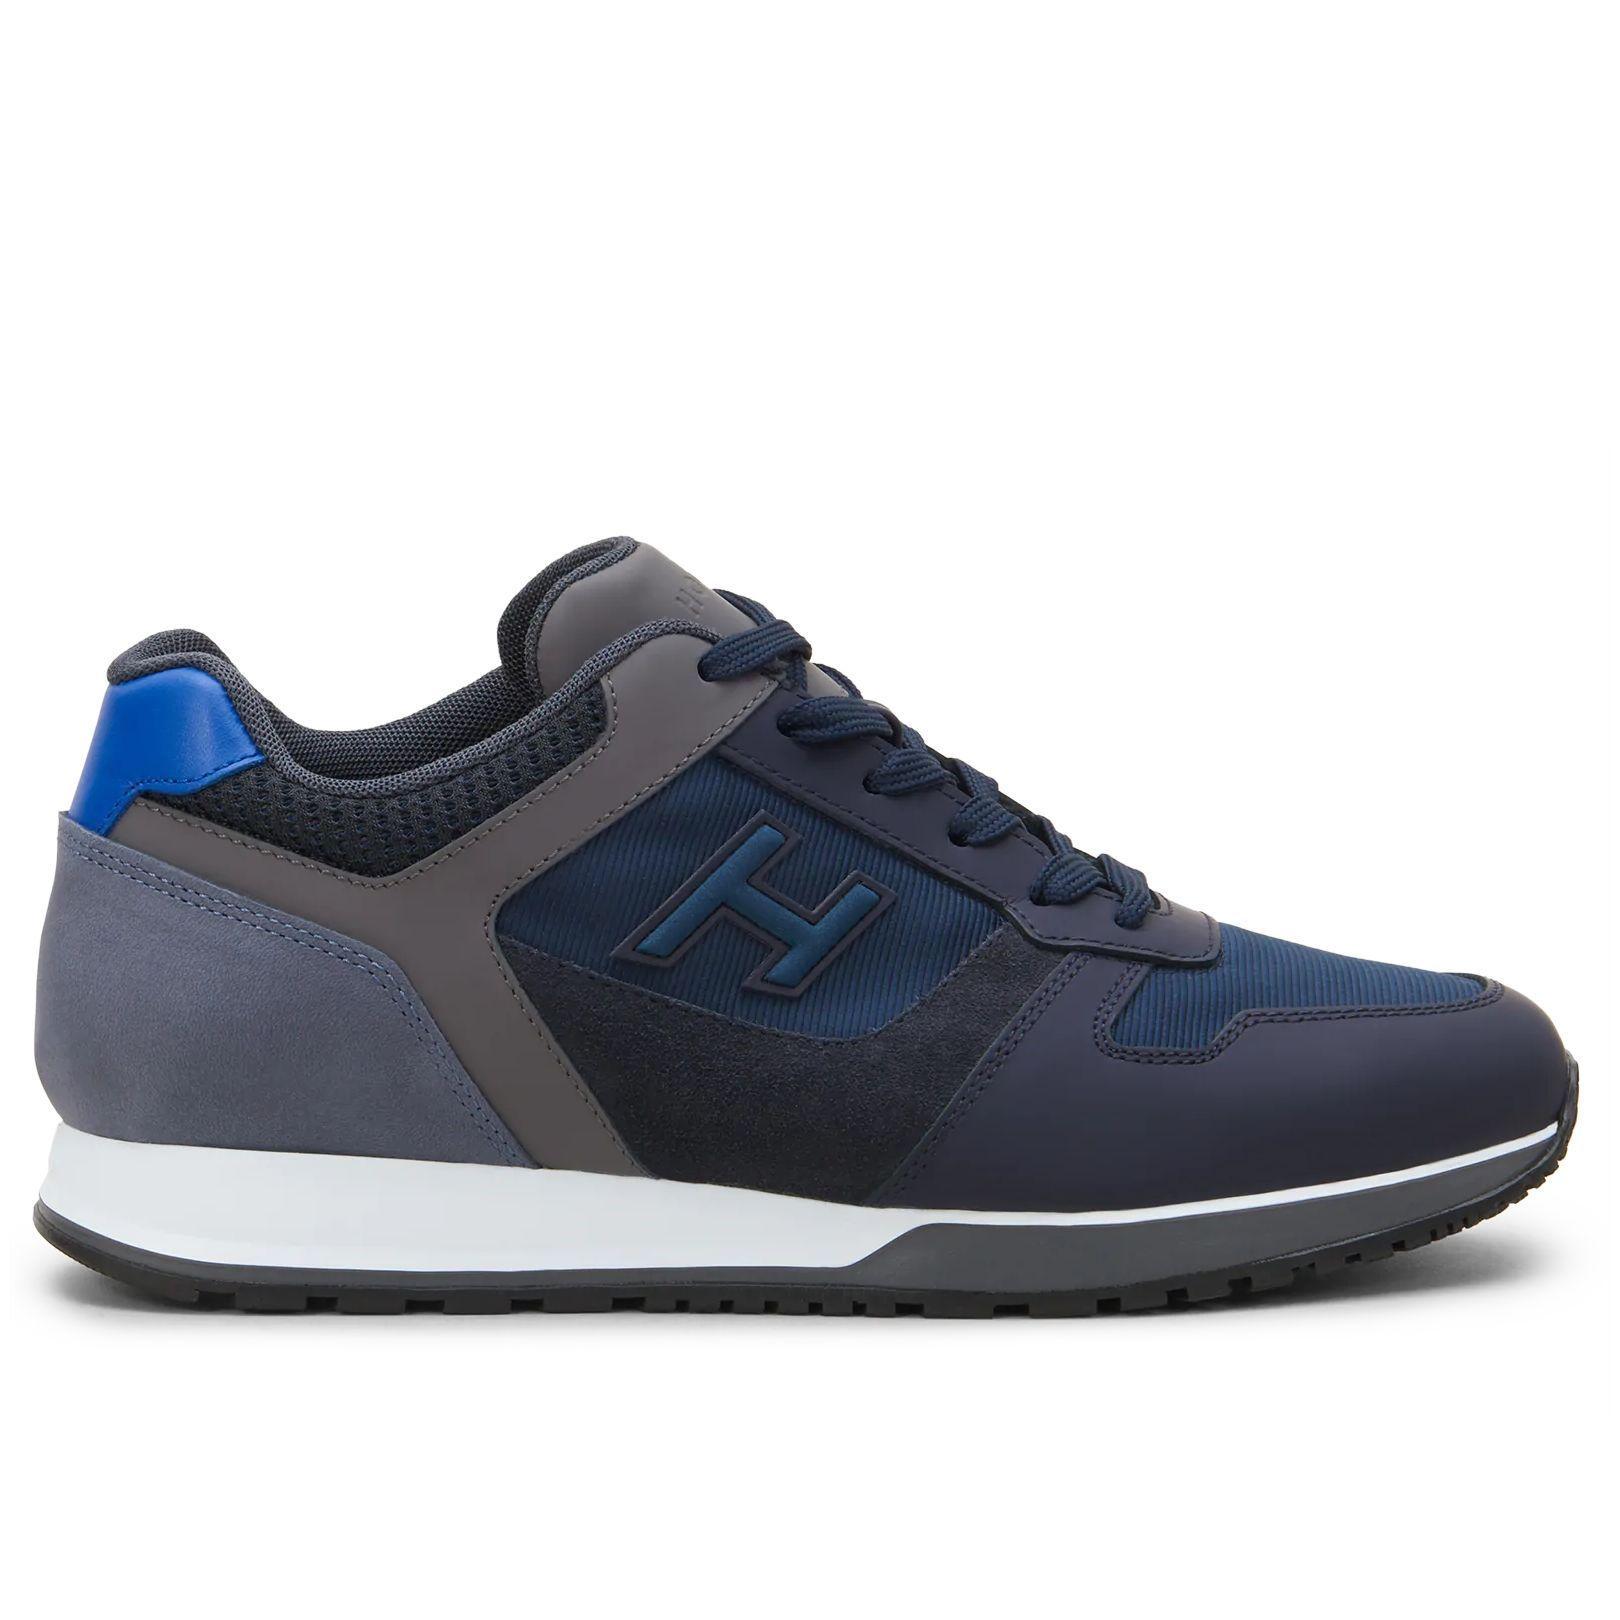 Sneakers uomo Hogan H321 blu e grigia   Grey sneakers, Sneakers ...